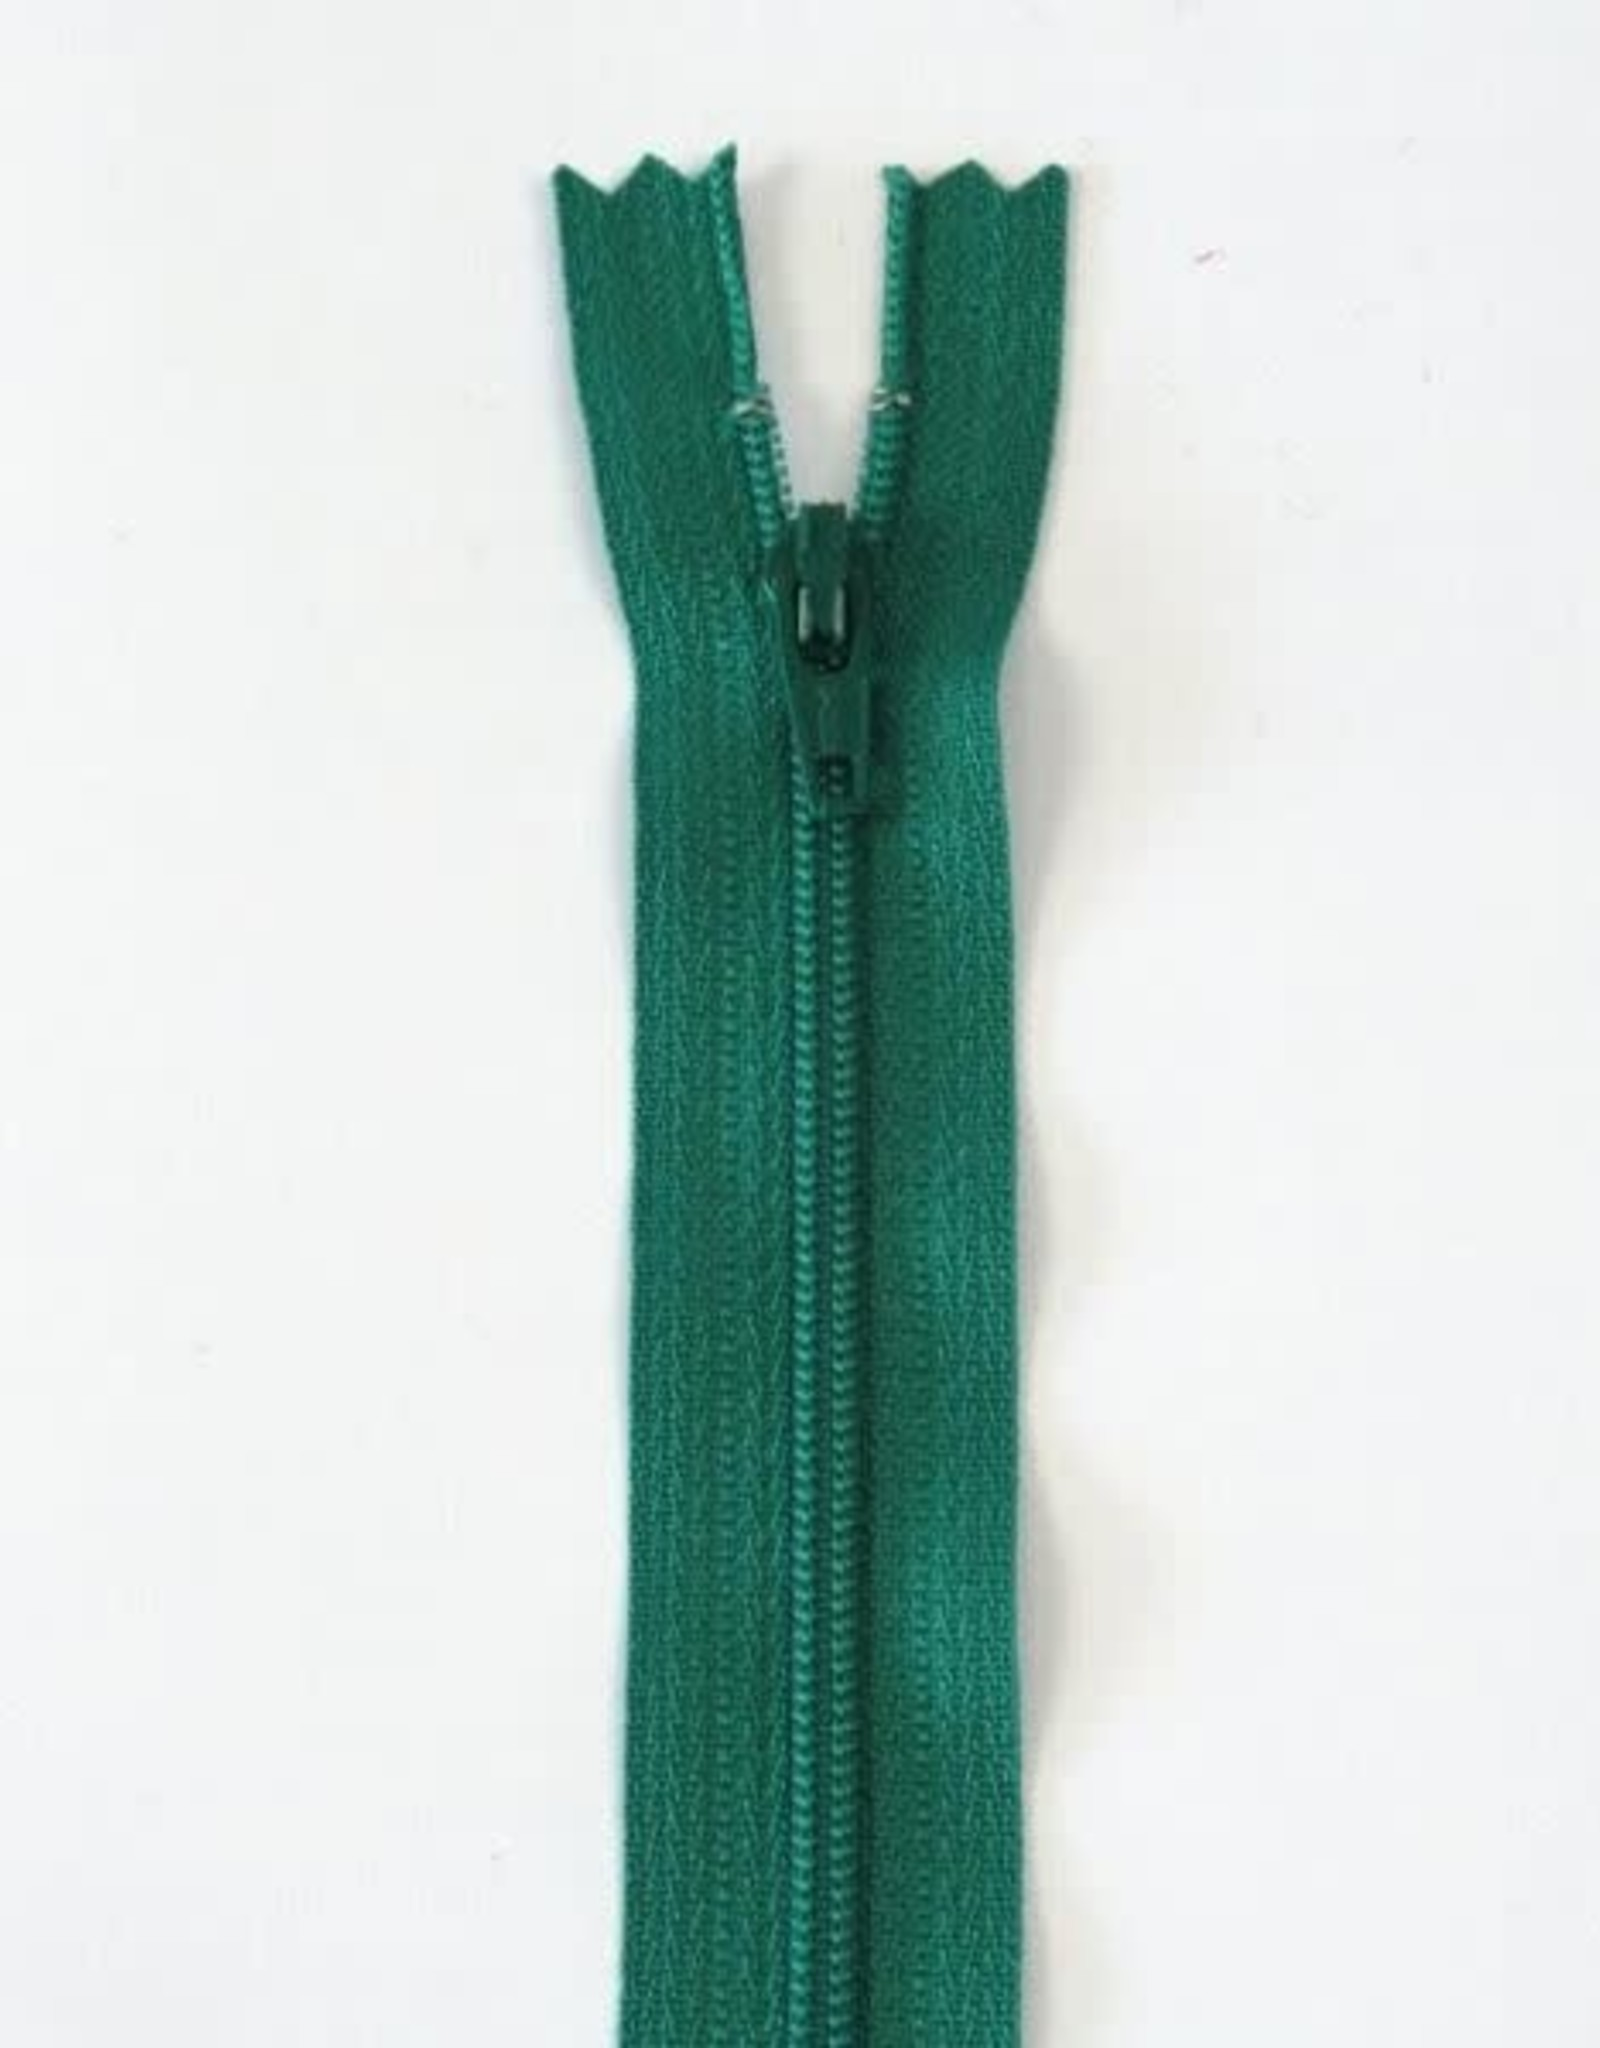 YKK Spiraalrits niet-DB 3mm grasgroen 540-55cm